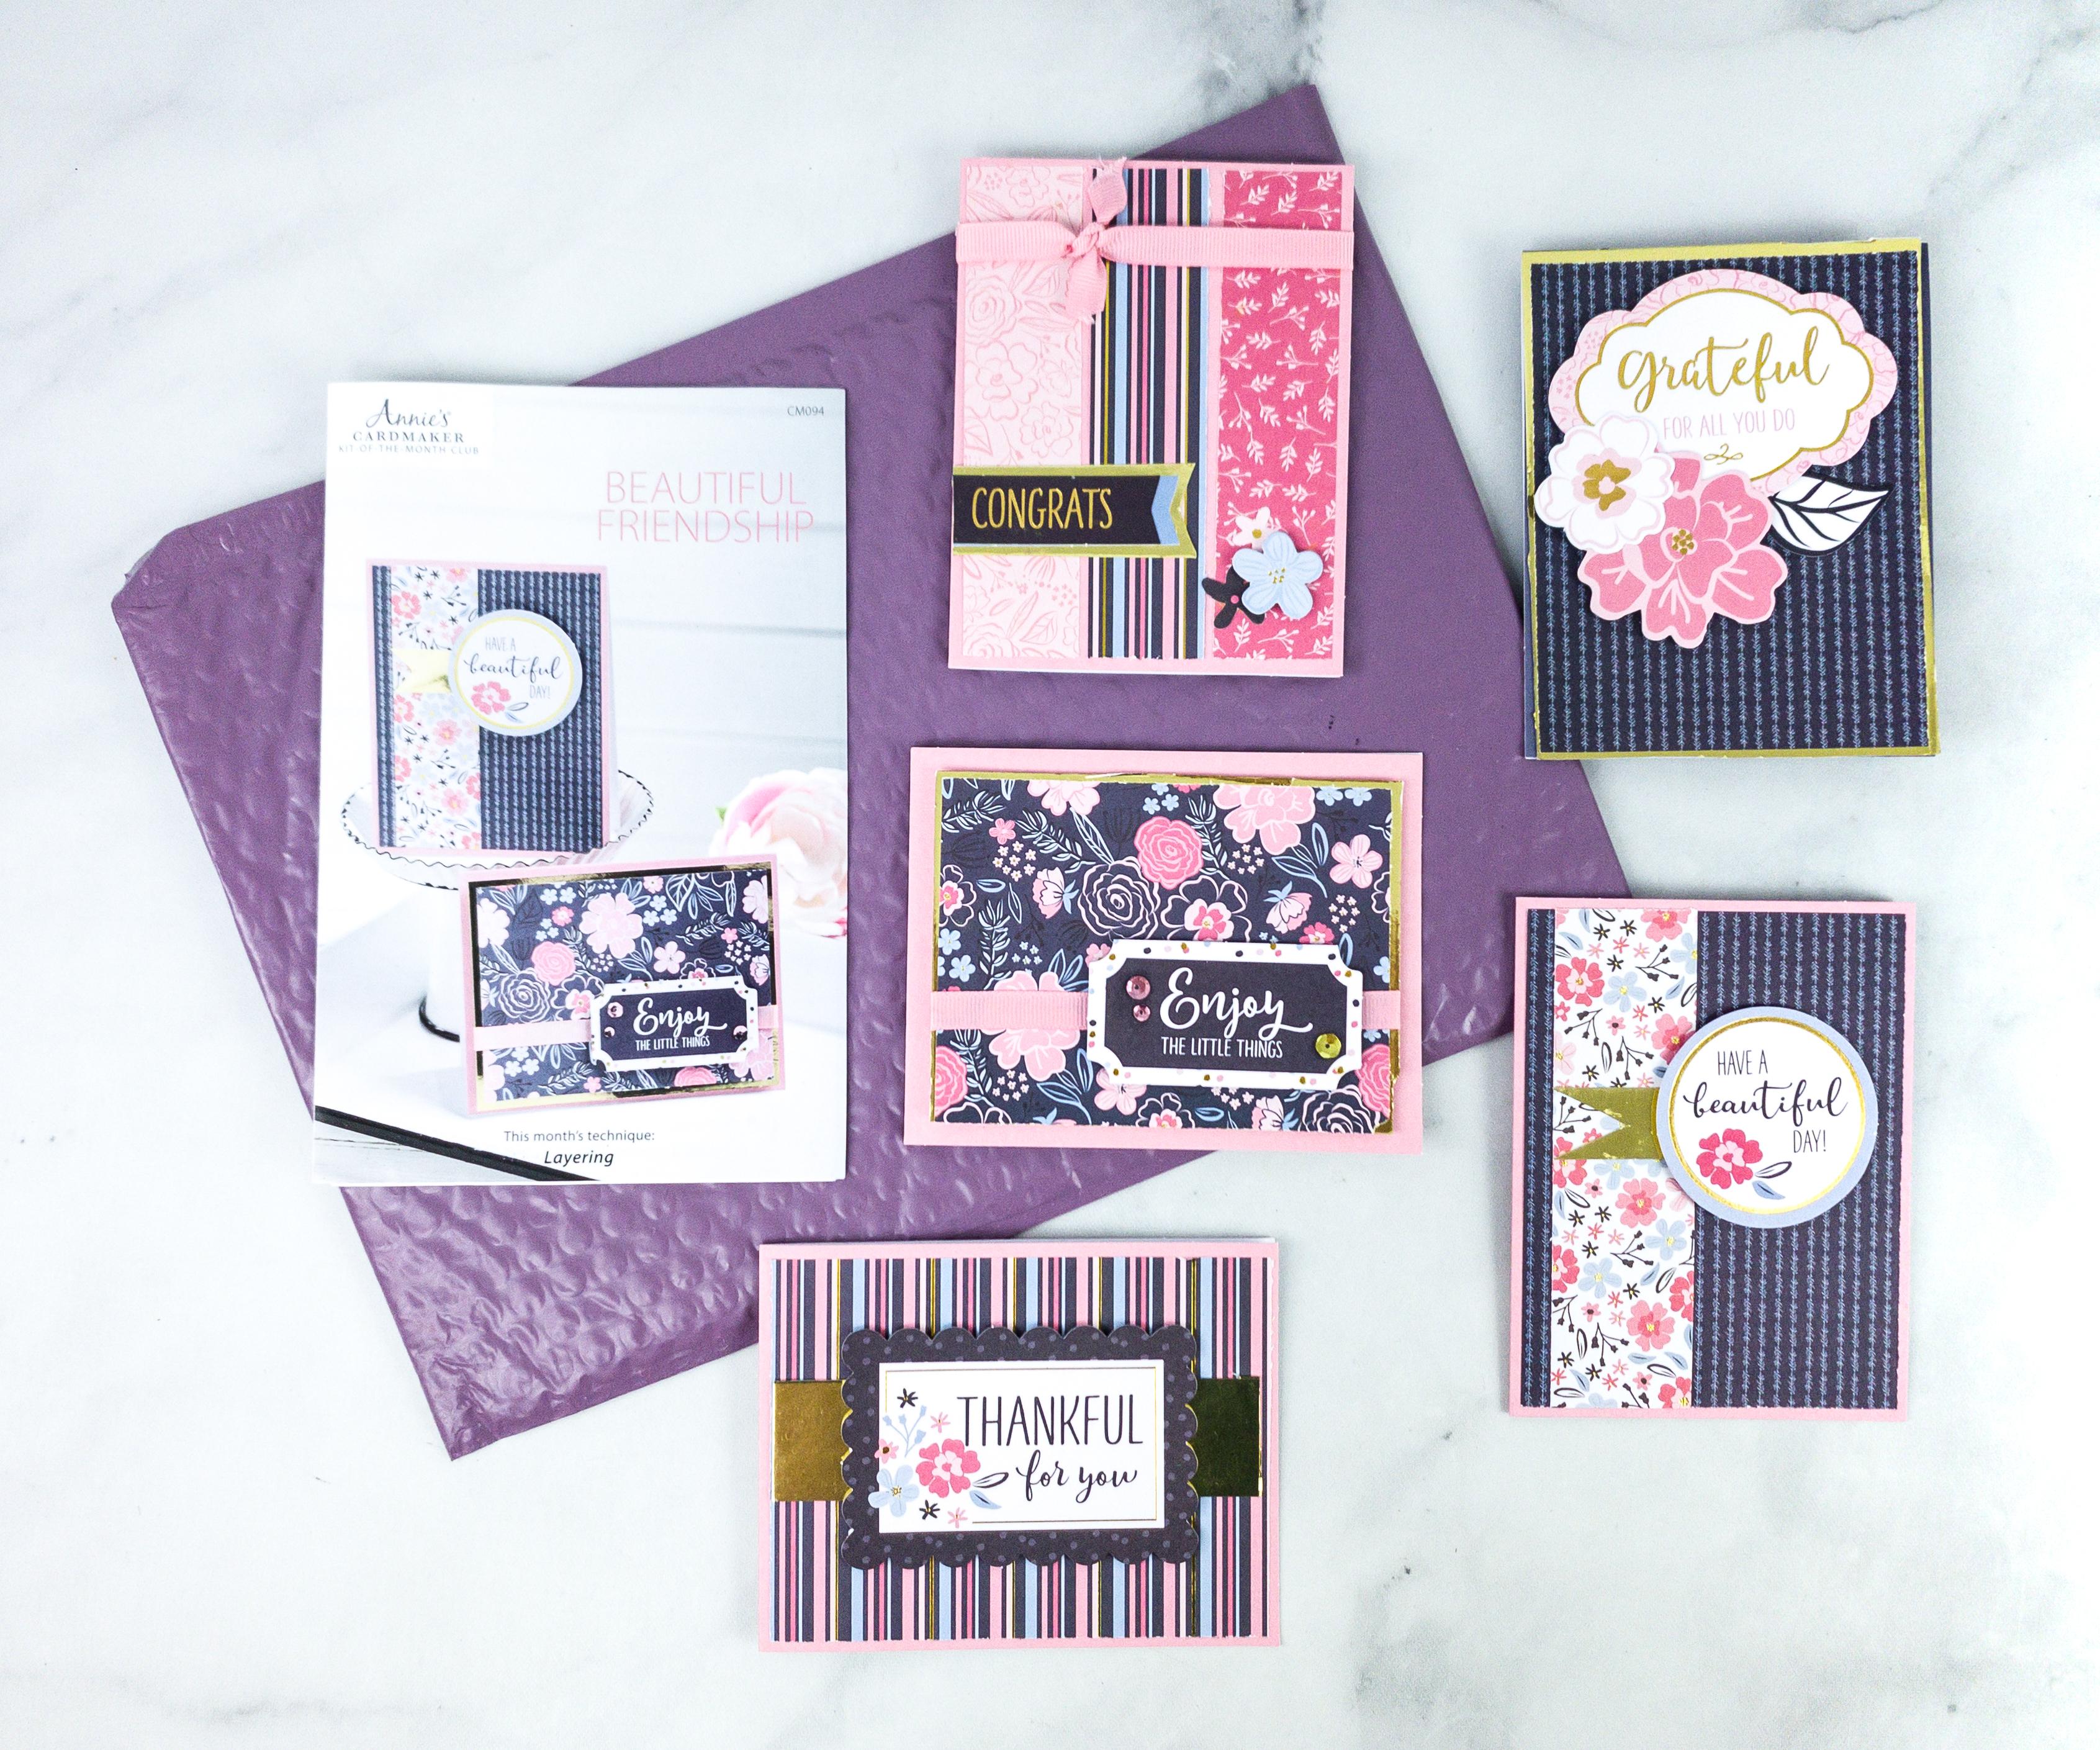 Three month card kit subscription